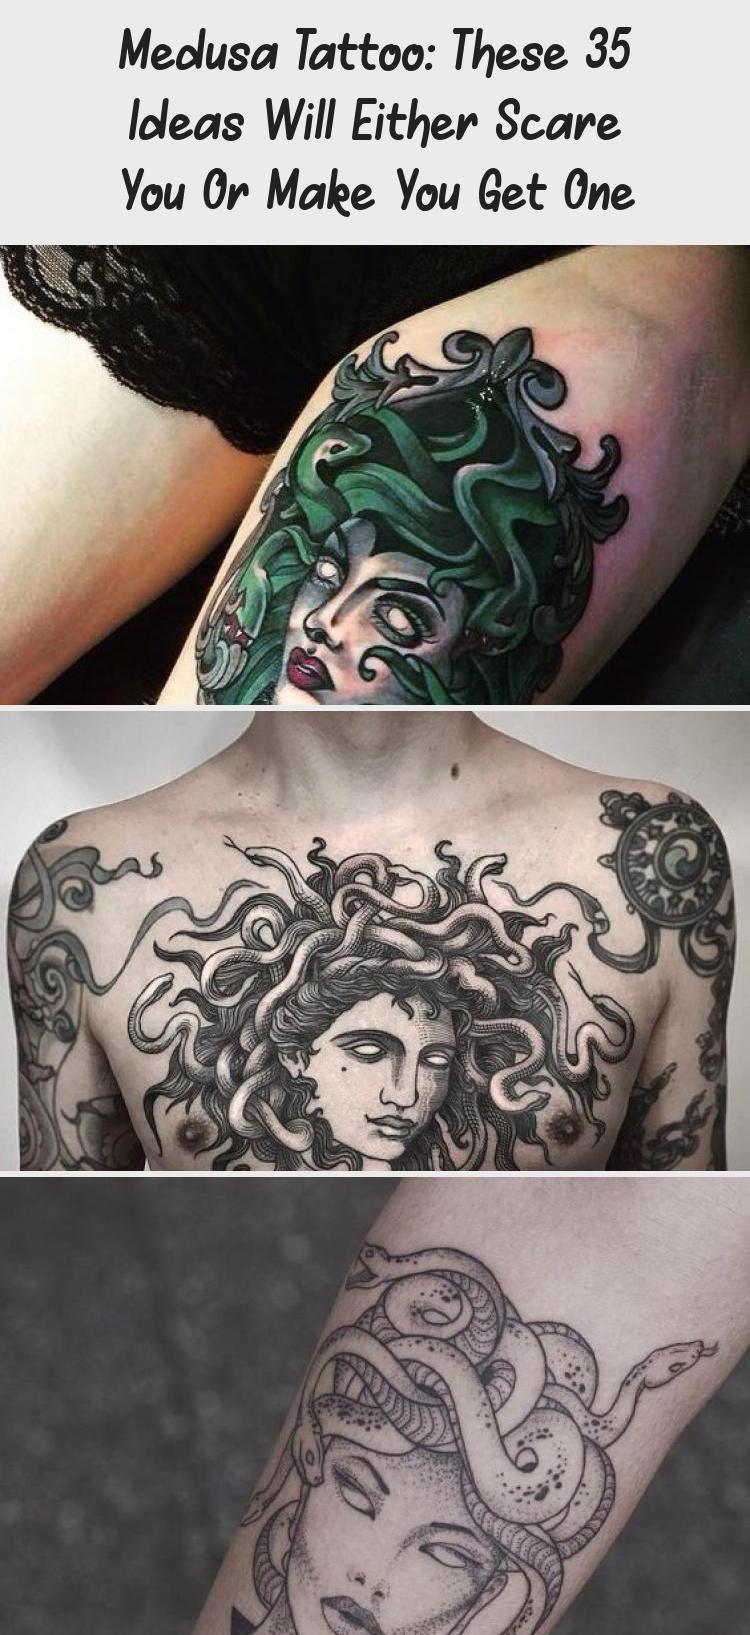 10+ Amazing Traditional medusa tattoo meaning ideas